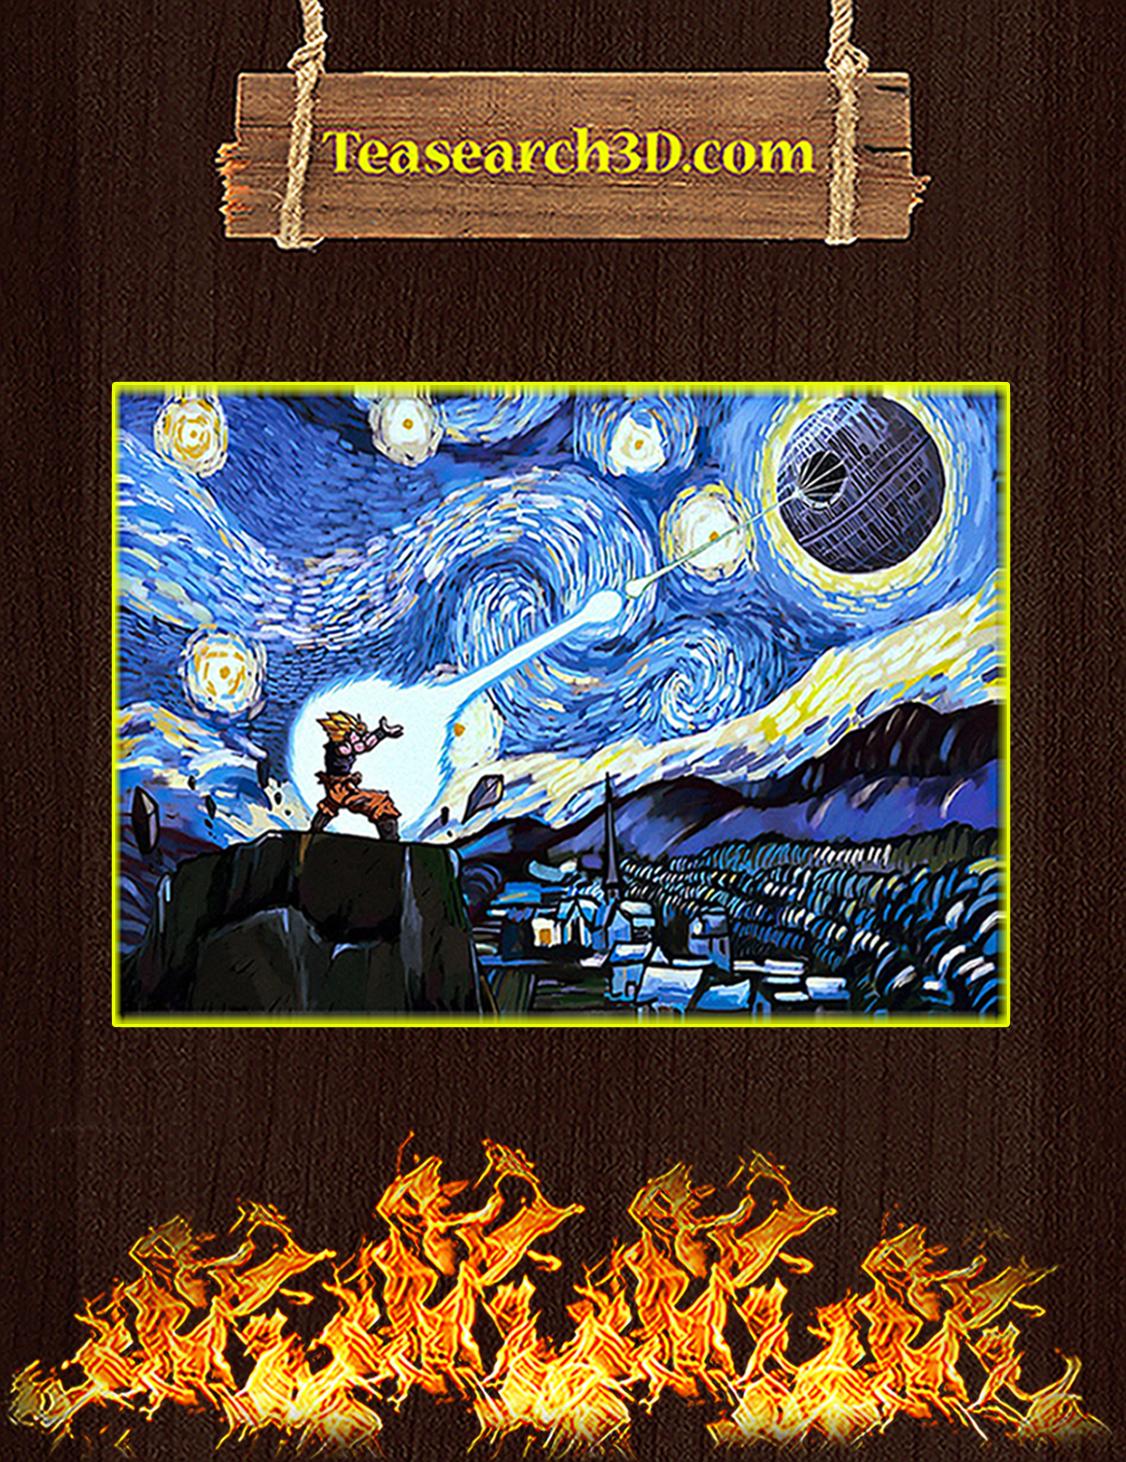 Goku vs Death Star starry night van gogh poster A3